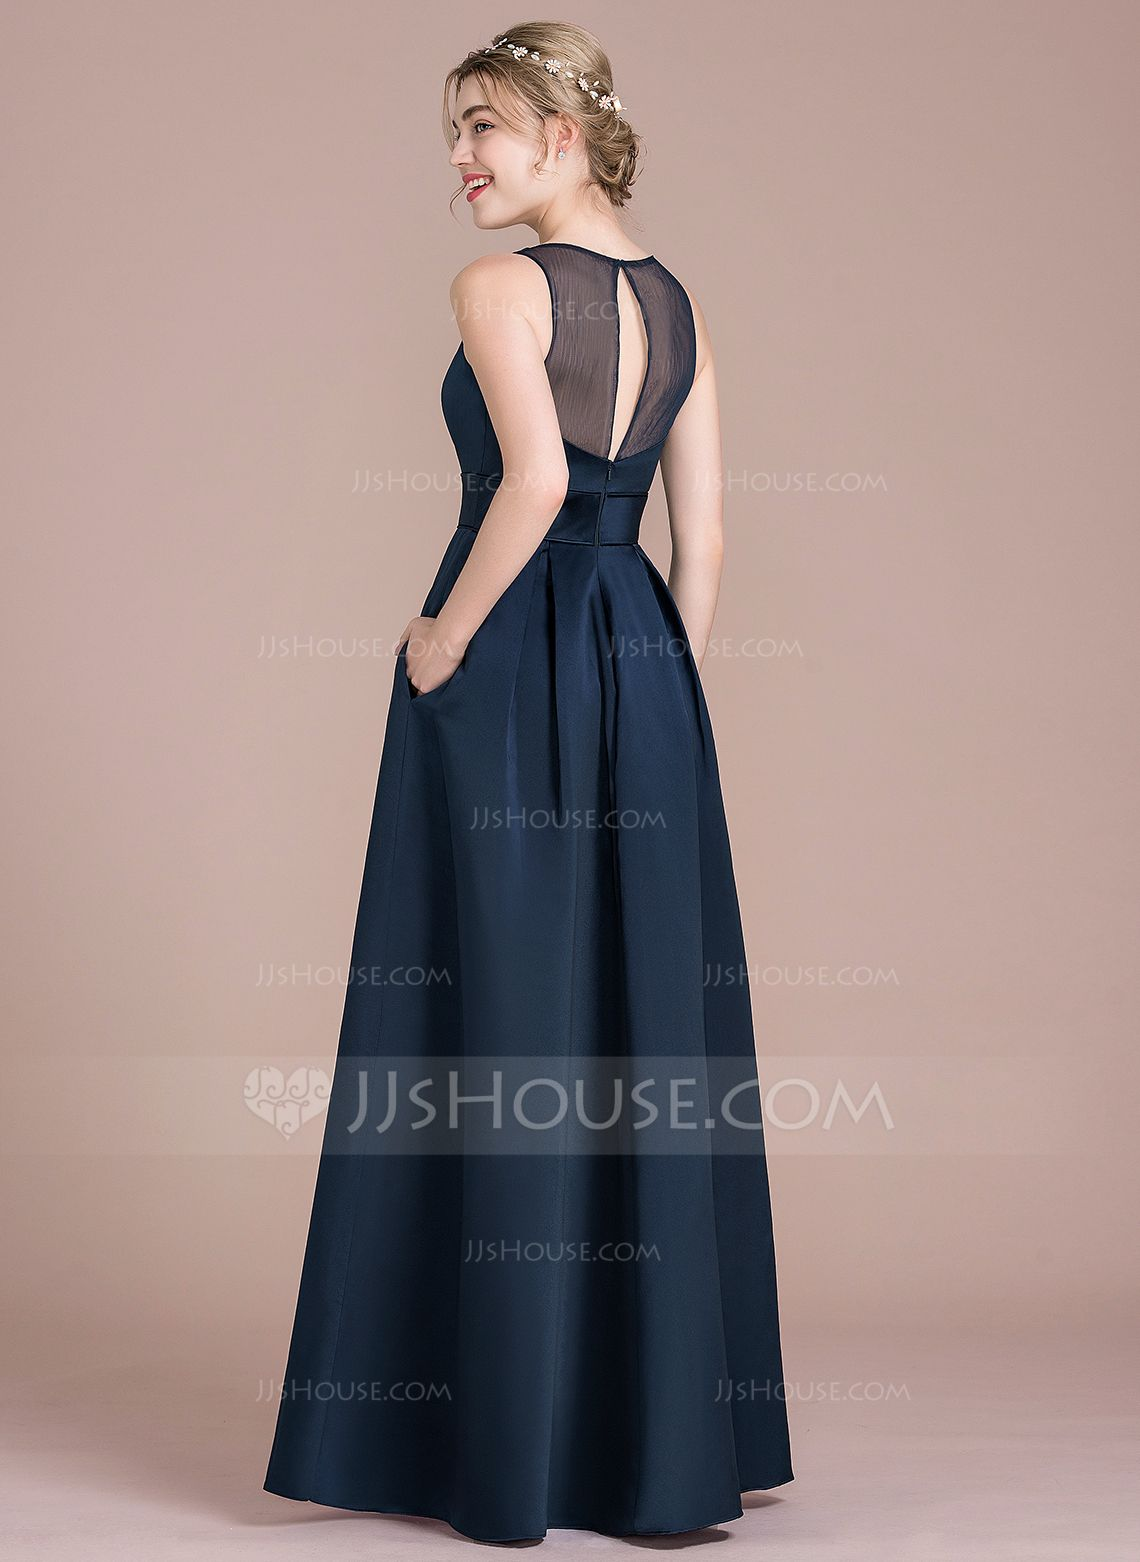 e589d2dc3c2 A-Line Princess Scoop Neck Floor-Length Satin Bridesmaid Dress With ...